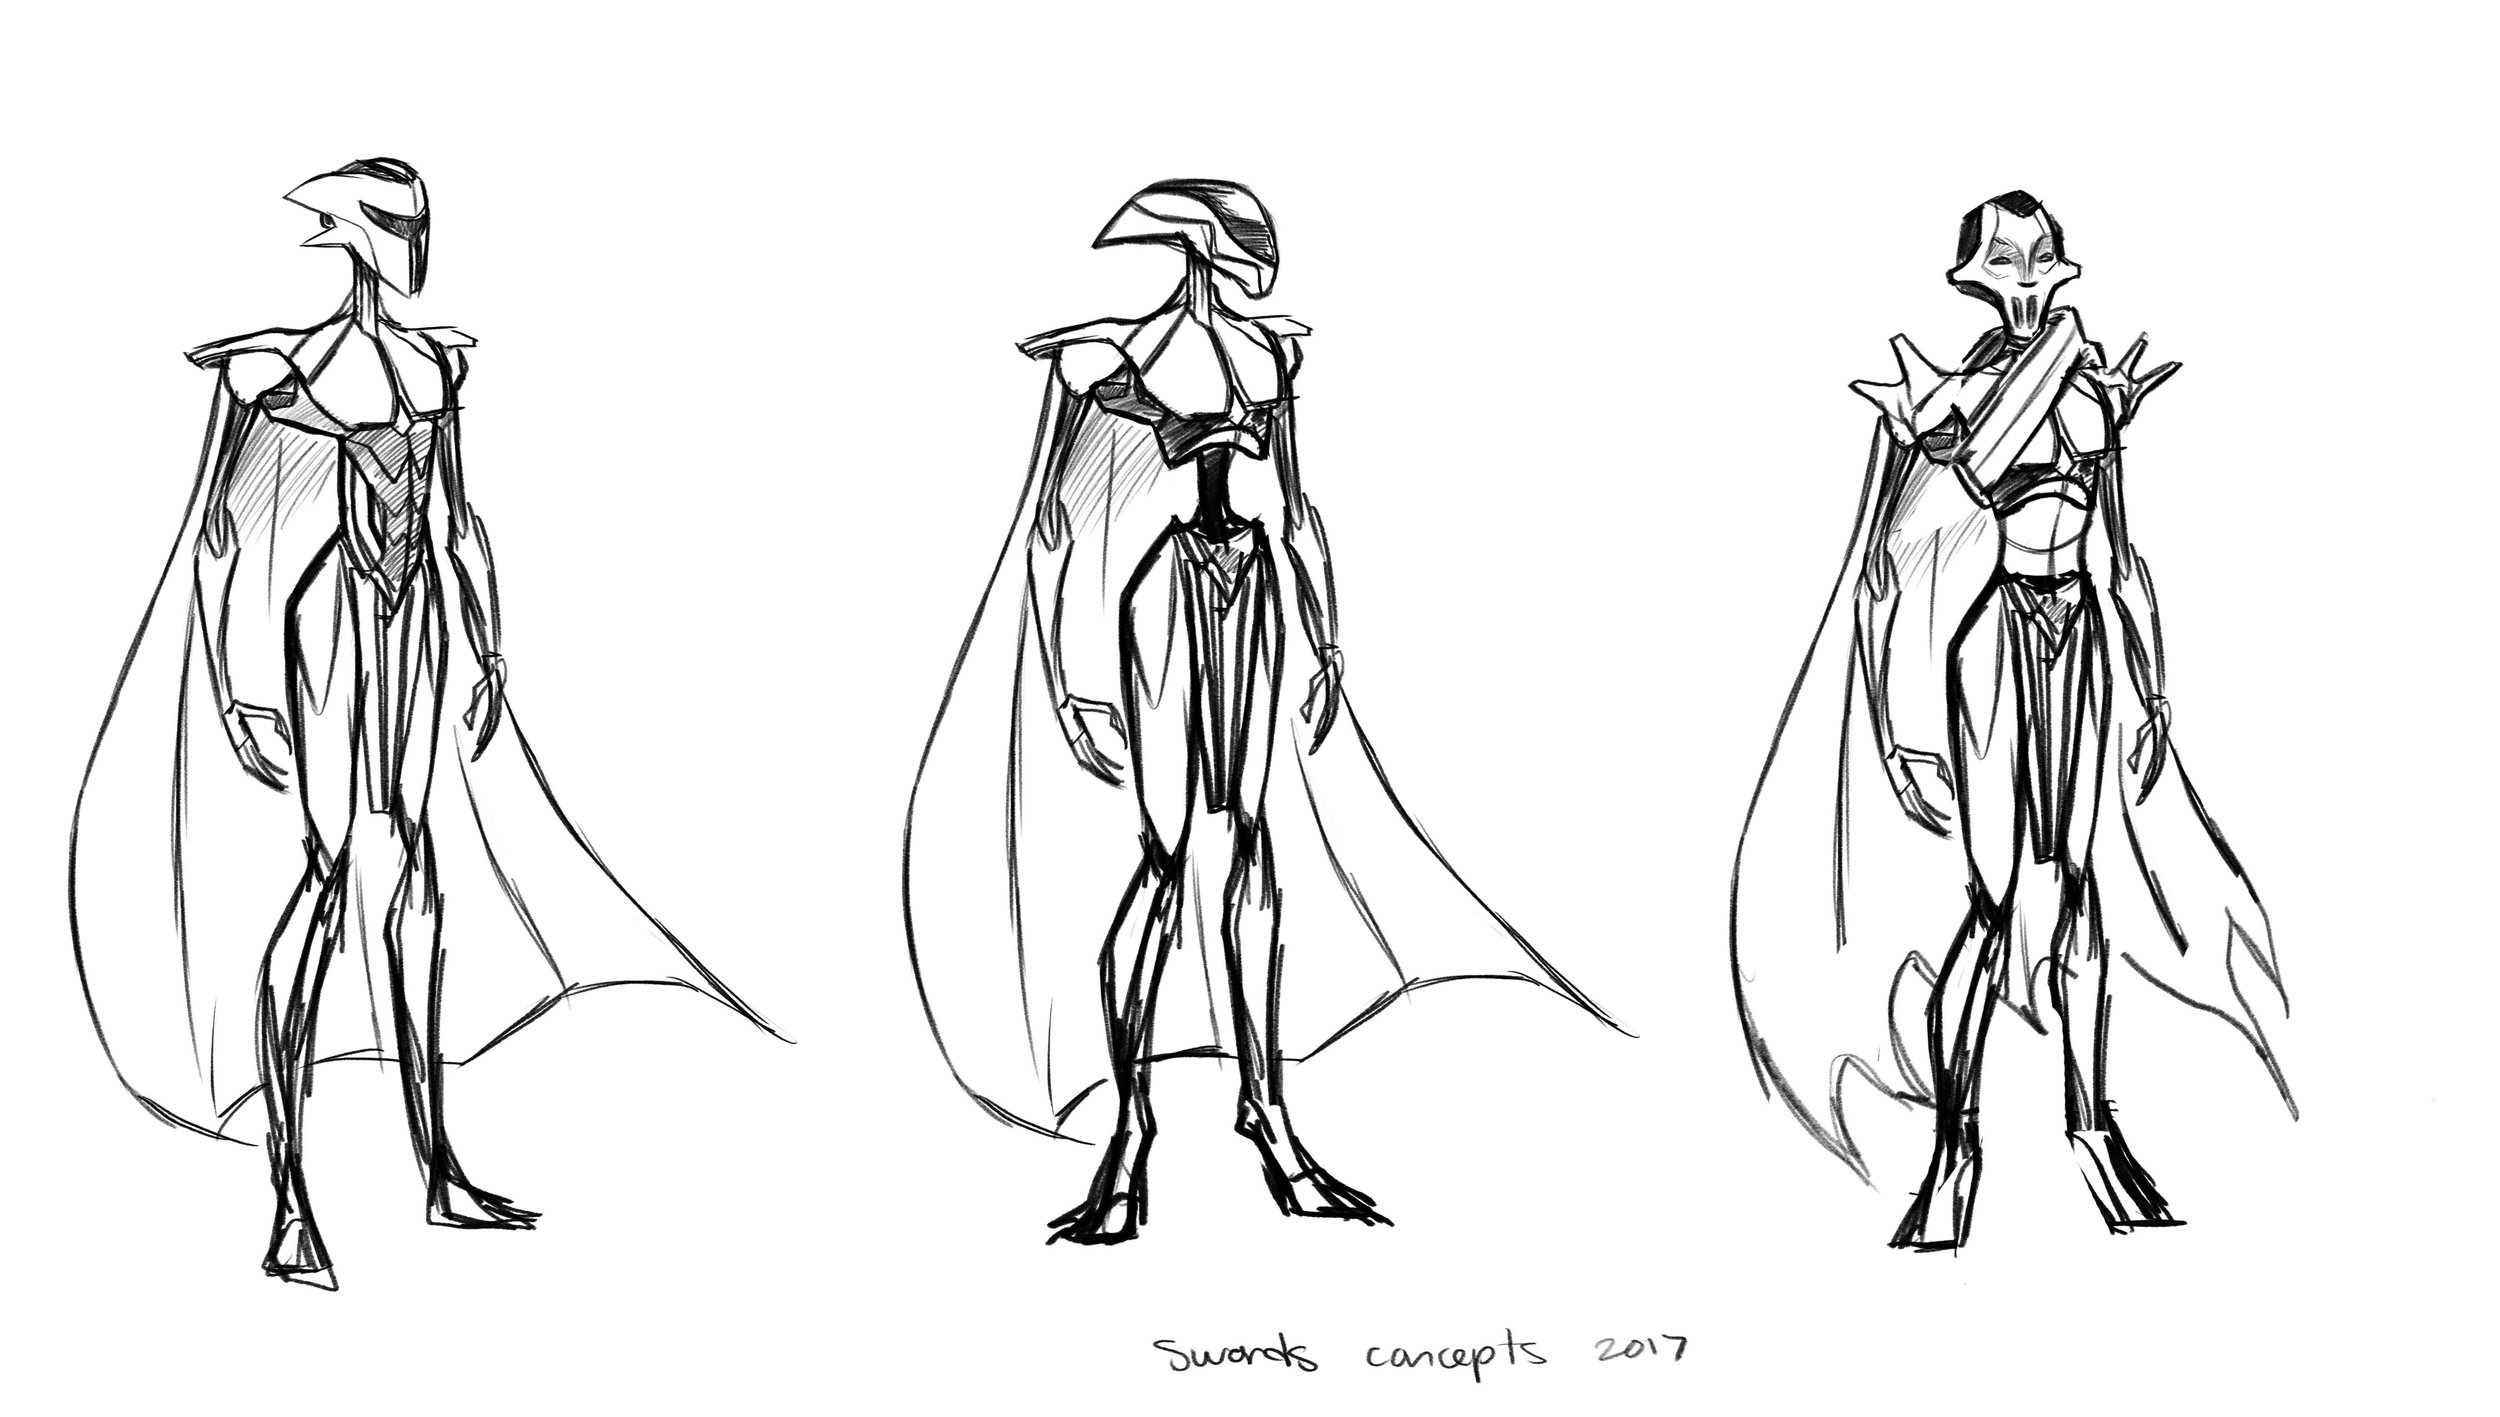 Swords concepts01.jpg